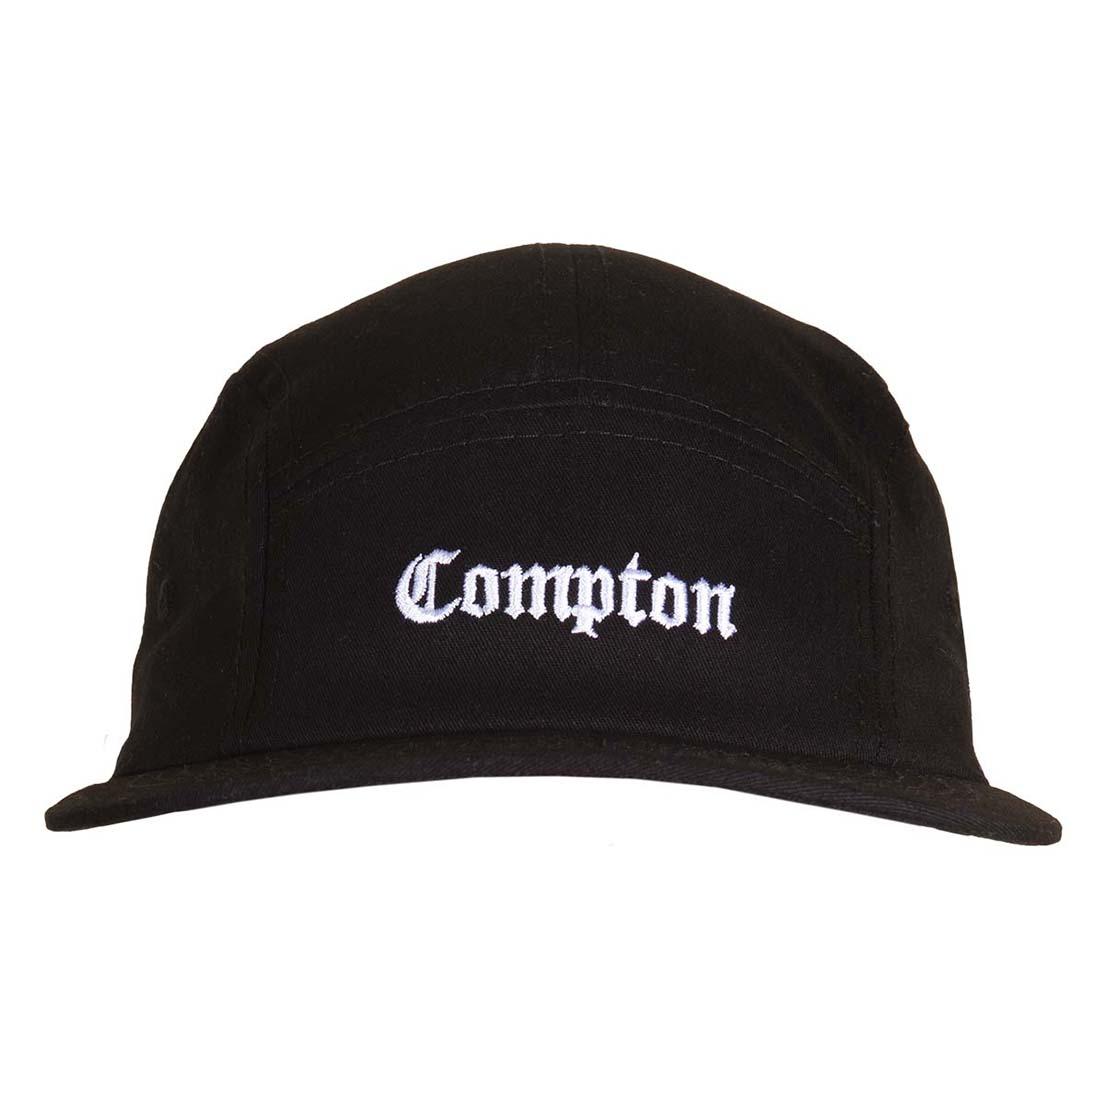 Boné Five Panel Strapback Compton Básico